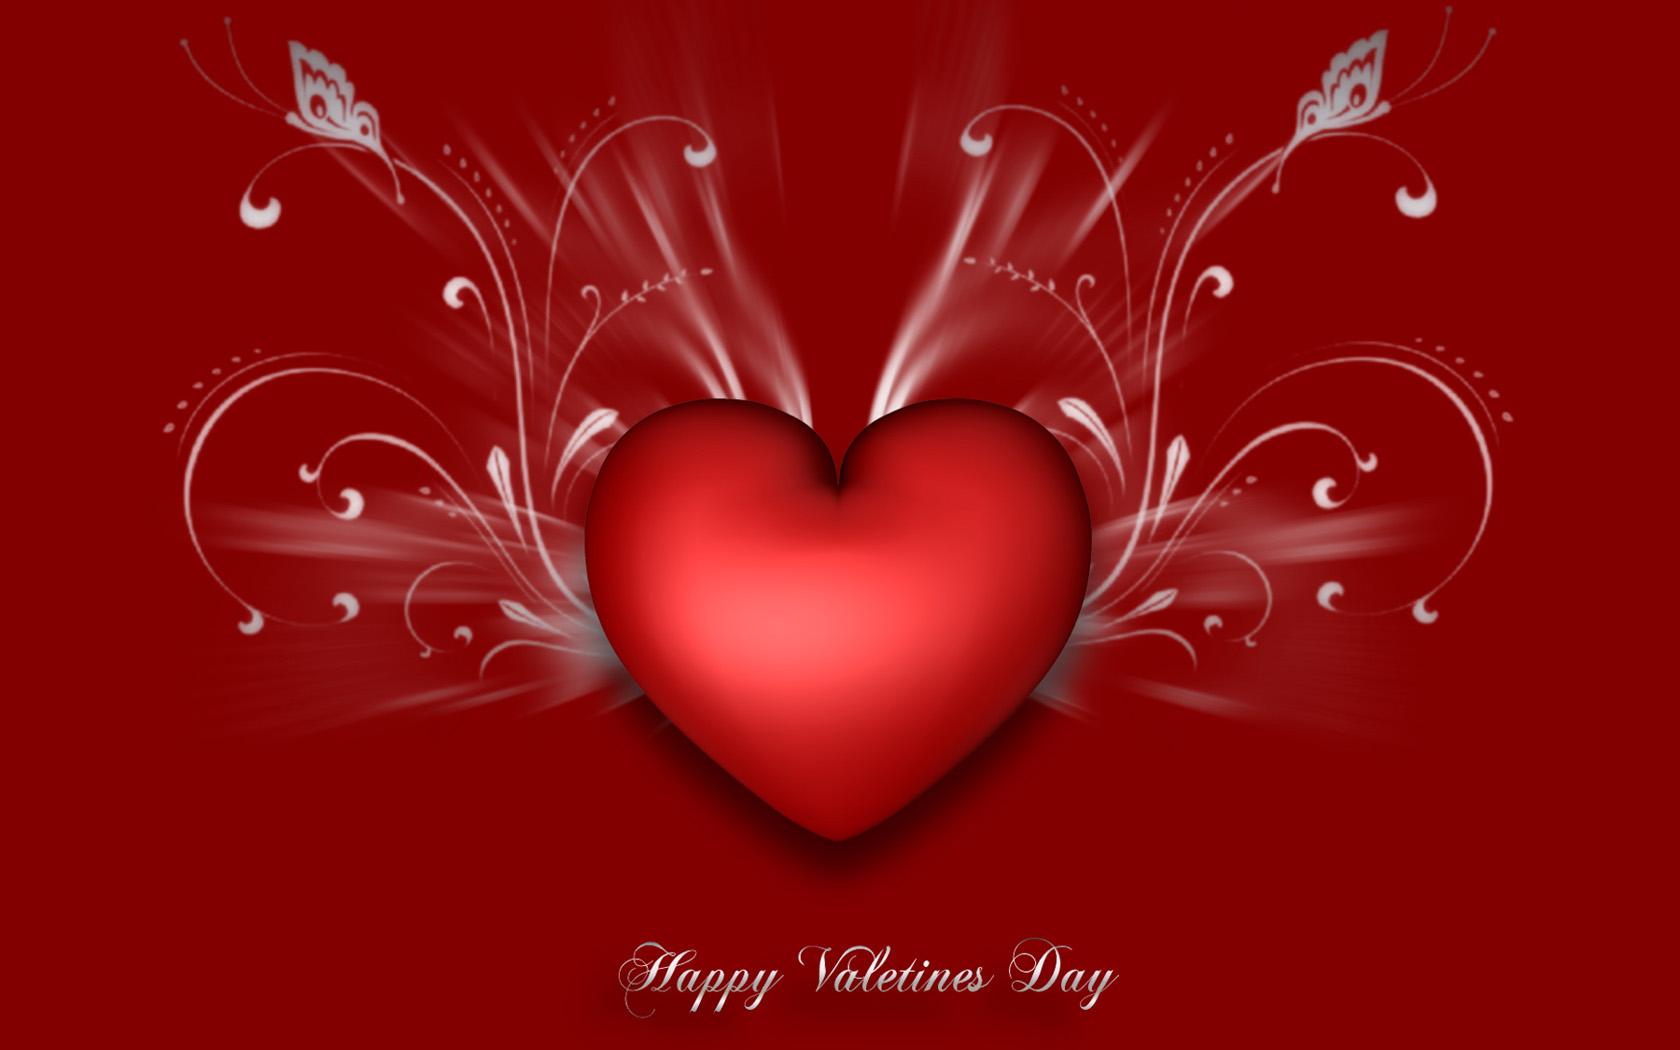 Valentines-Day-full-HD-Wallpaper-08